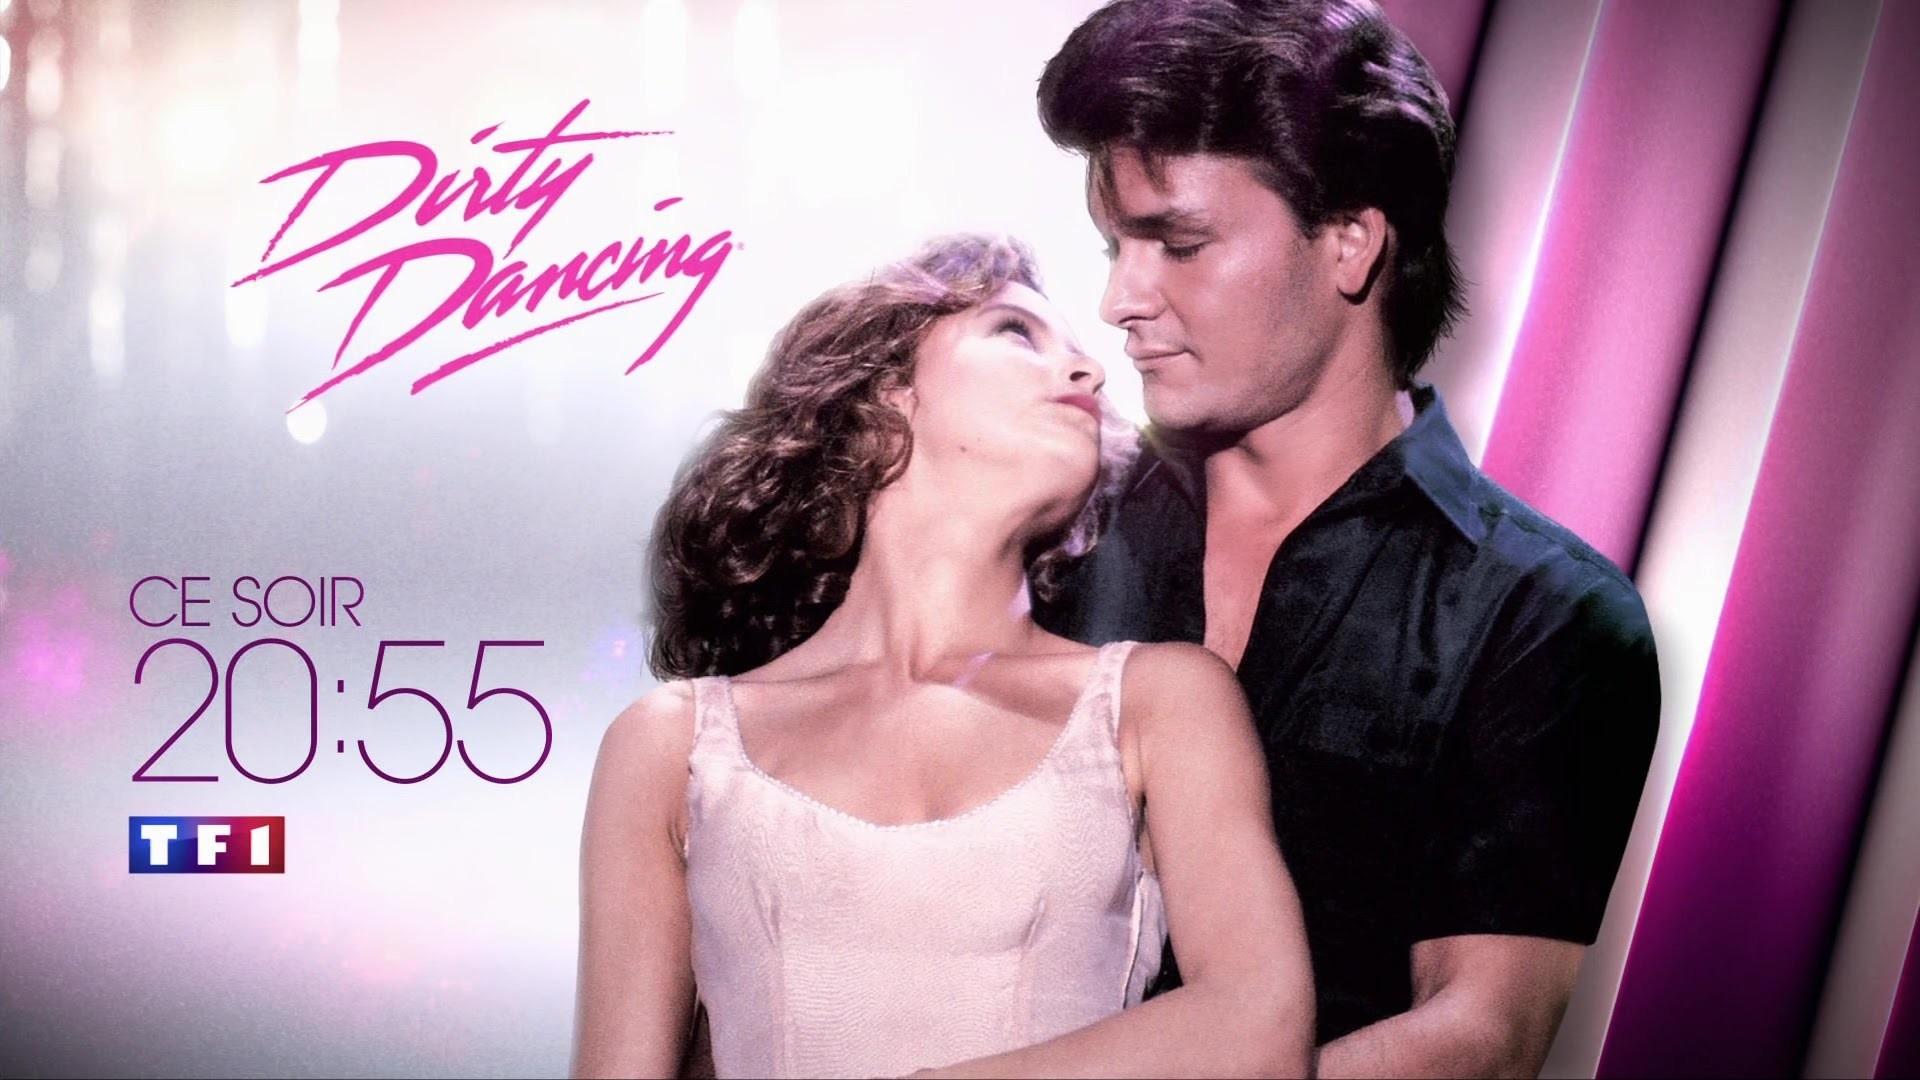 Res: 1920x1080, BA TF1 2016 Dirty Dancing avec Patrick Swayze de 1987 19 06 2016